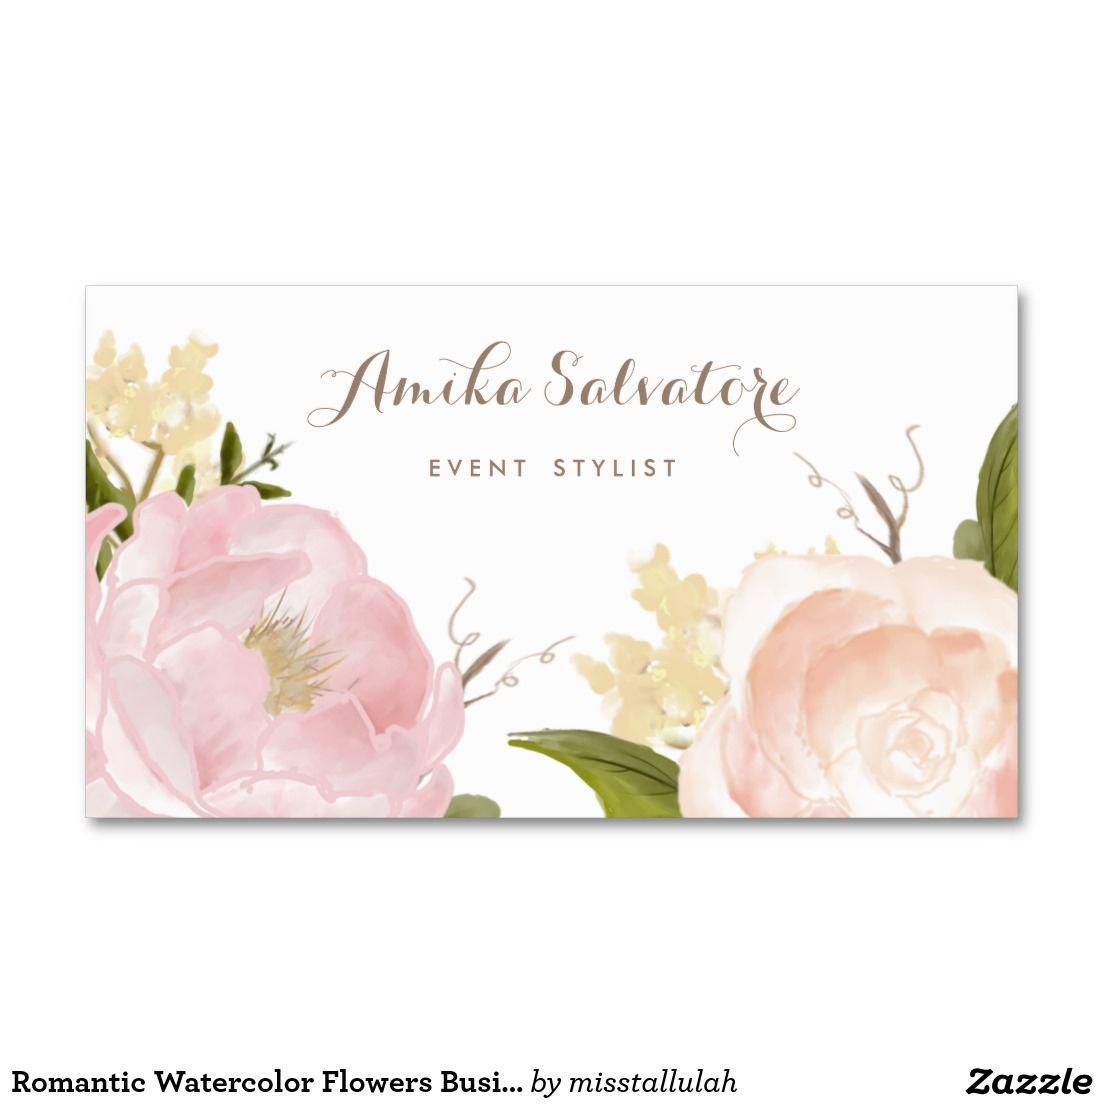 Romantic Watercolor Flowers Business Card | Pinterest | Business ...